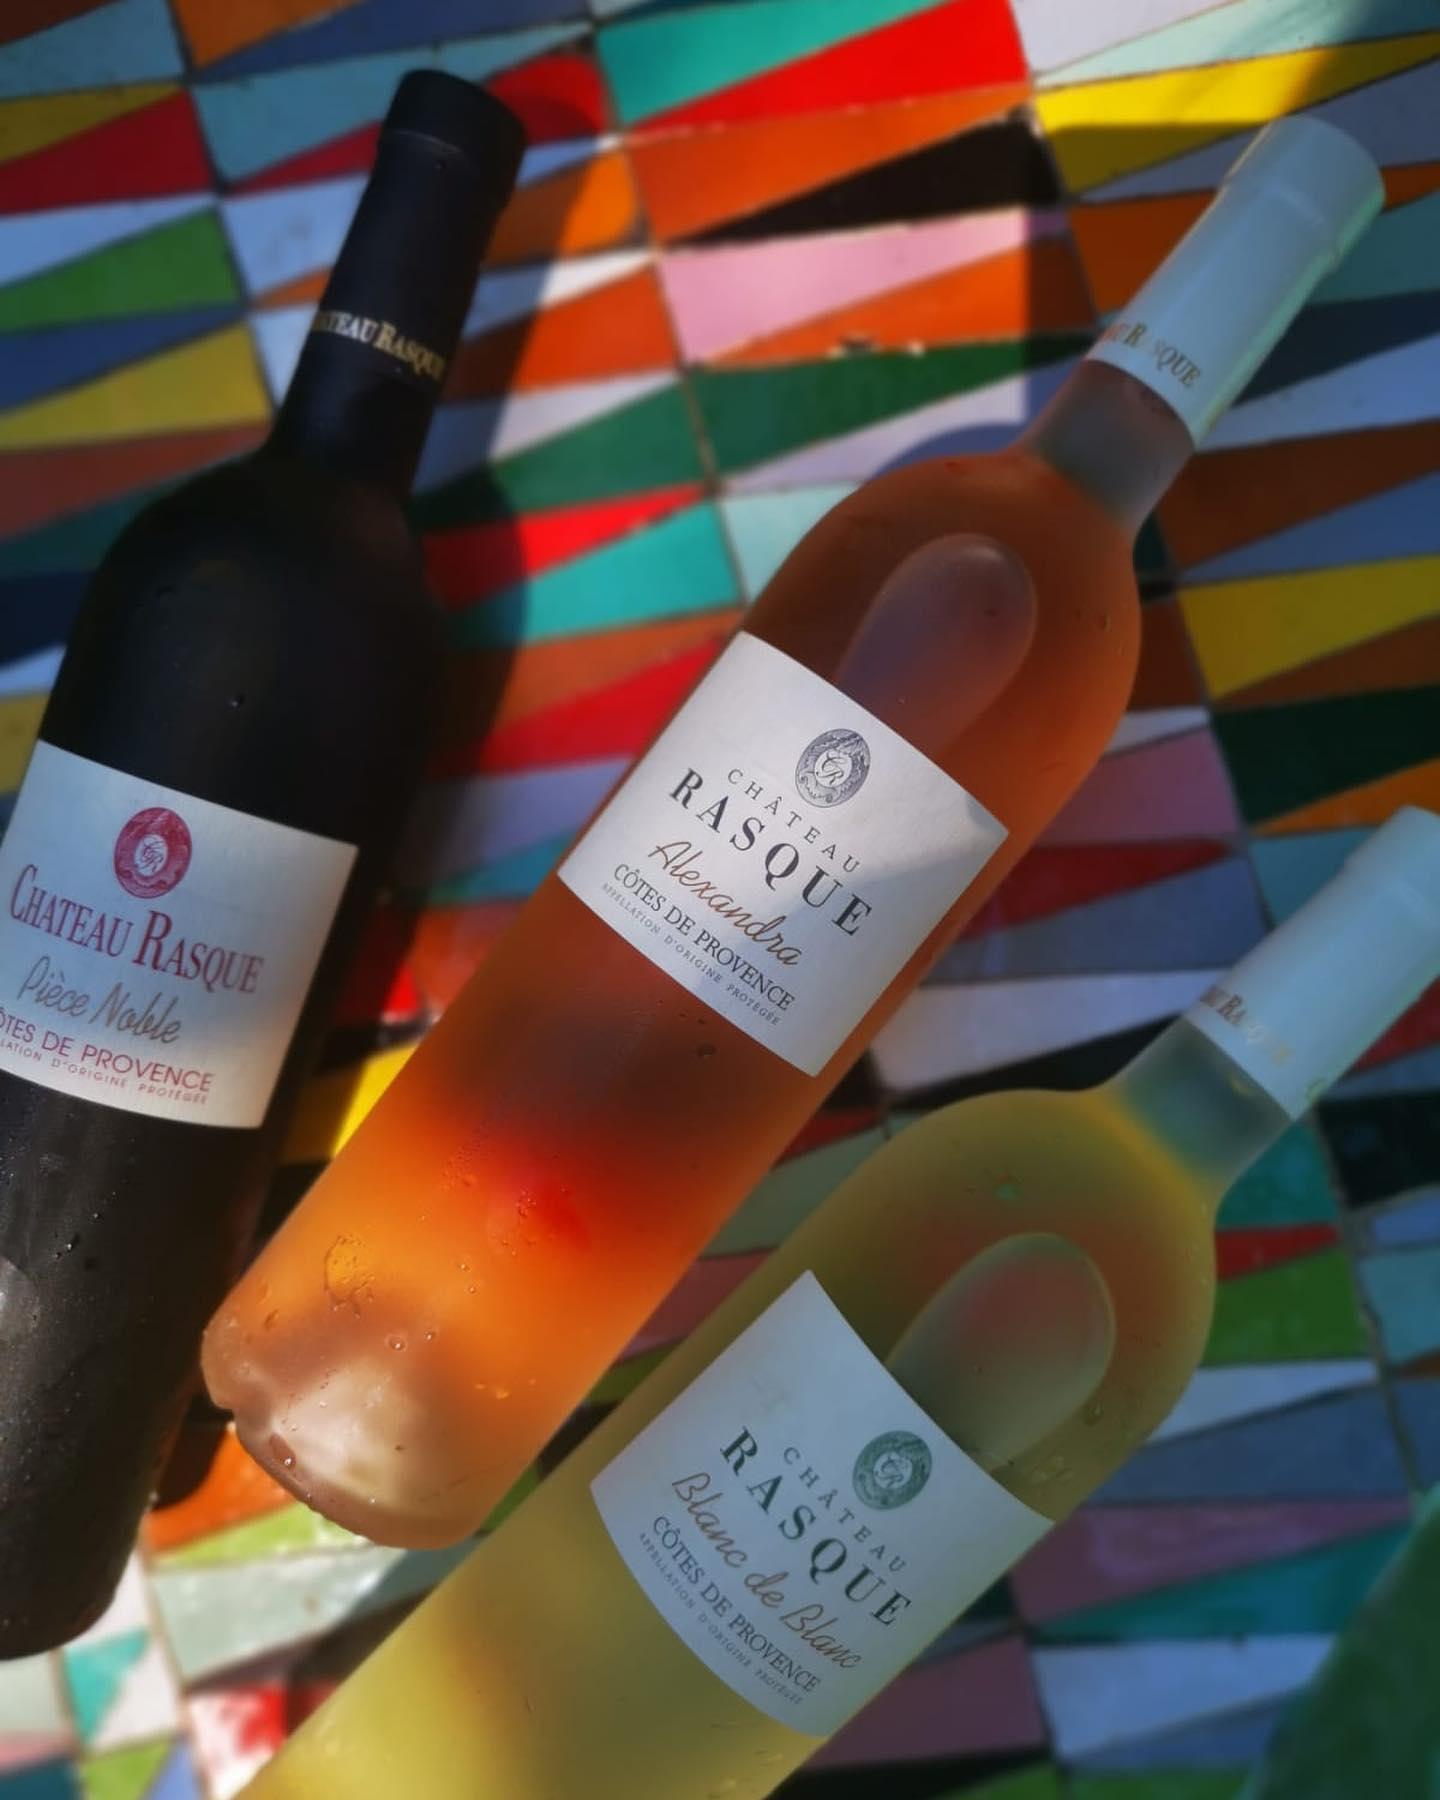 Pleins de nouveaux produits à vous faire découvrir sur notre carte  #villadjunah #djunahliving #antibes #antibesjuanlespins #cotedazur #frenchriviera #southoffrance #provencal #mediterranean #boho #placetobe #happyhour #apero #foodie #paca #enjoy #drinkingbuddies #wine #wino #vindefrance